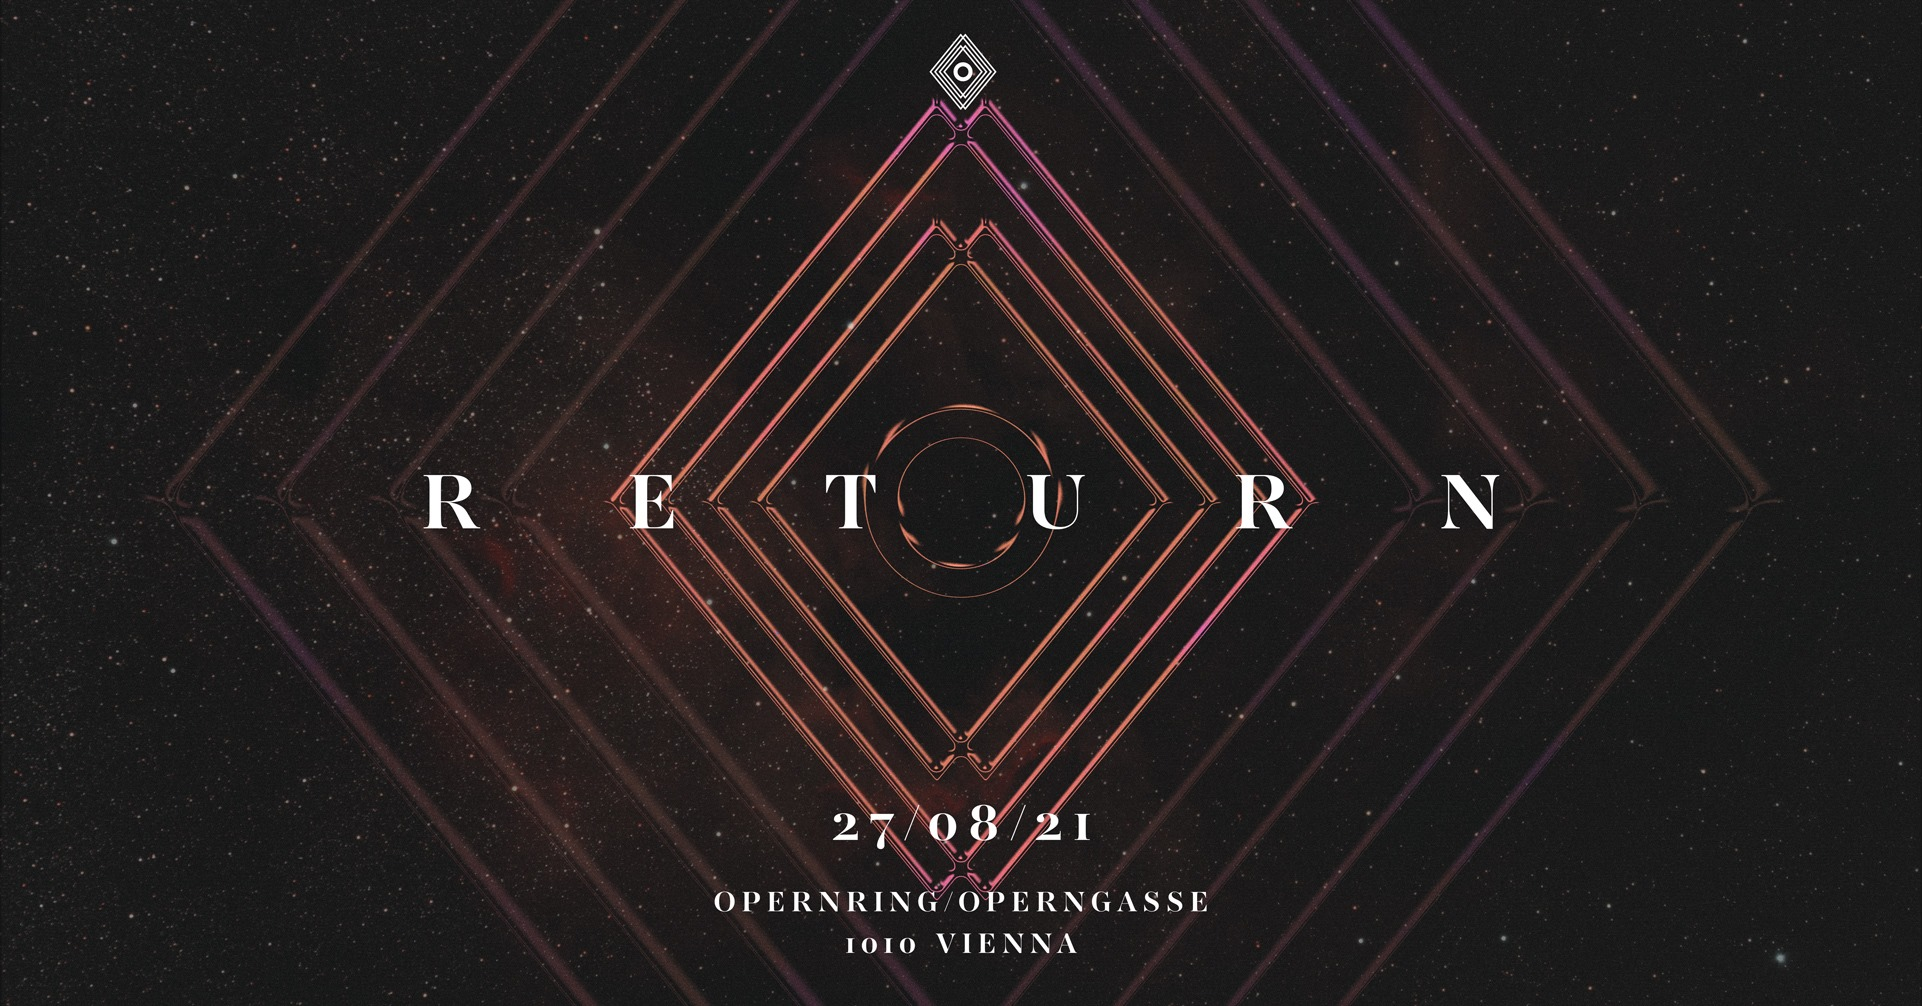 Events Wien: THE RETURN